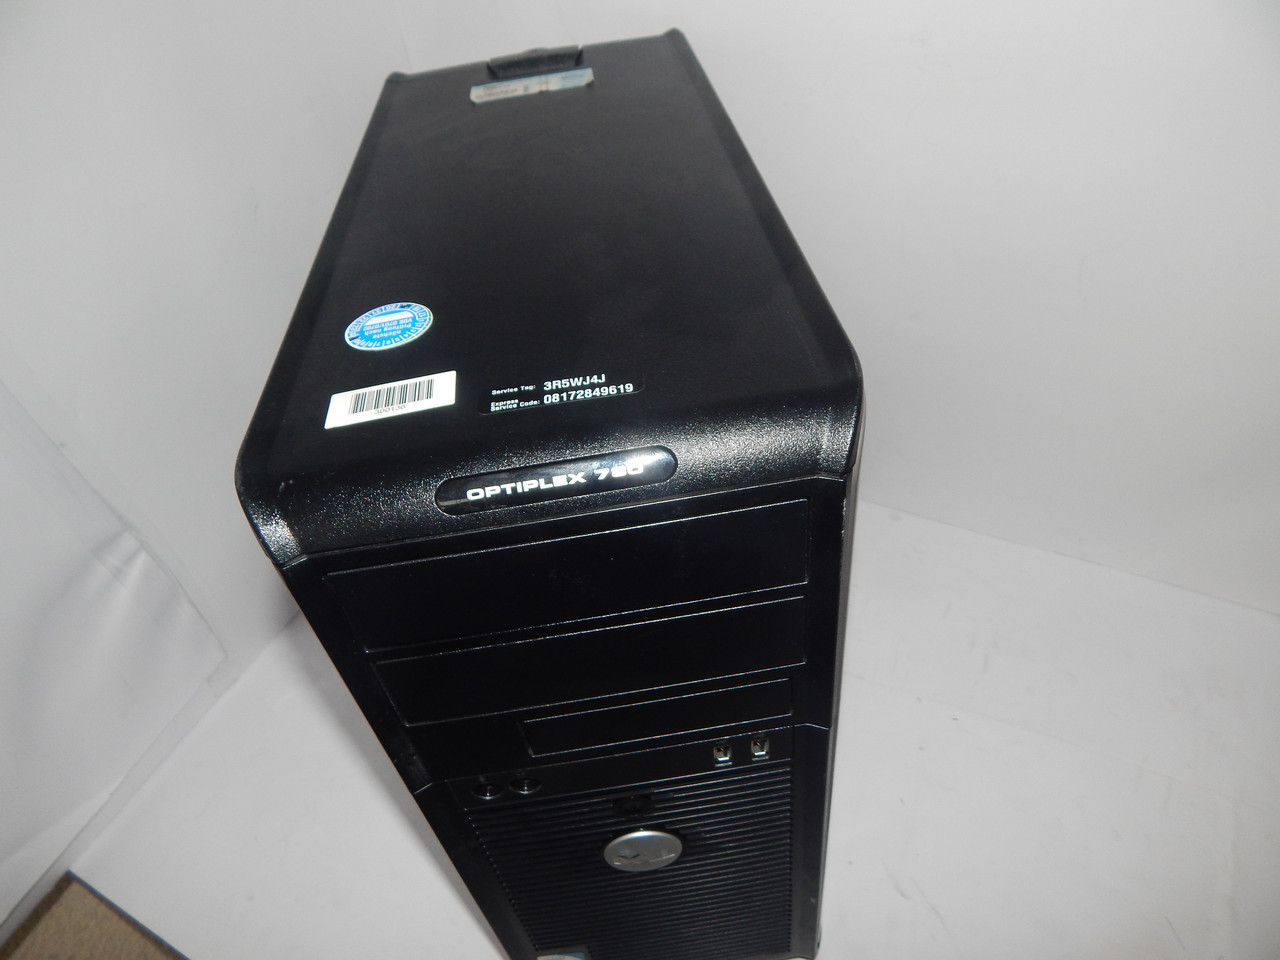 4-х ядерный системный блок компьютер проц Q6600 4ГБ DDR3 HDD 250 GB